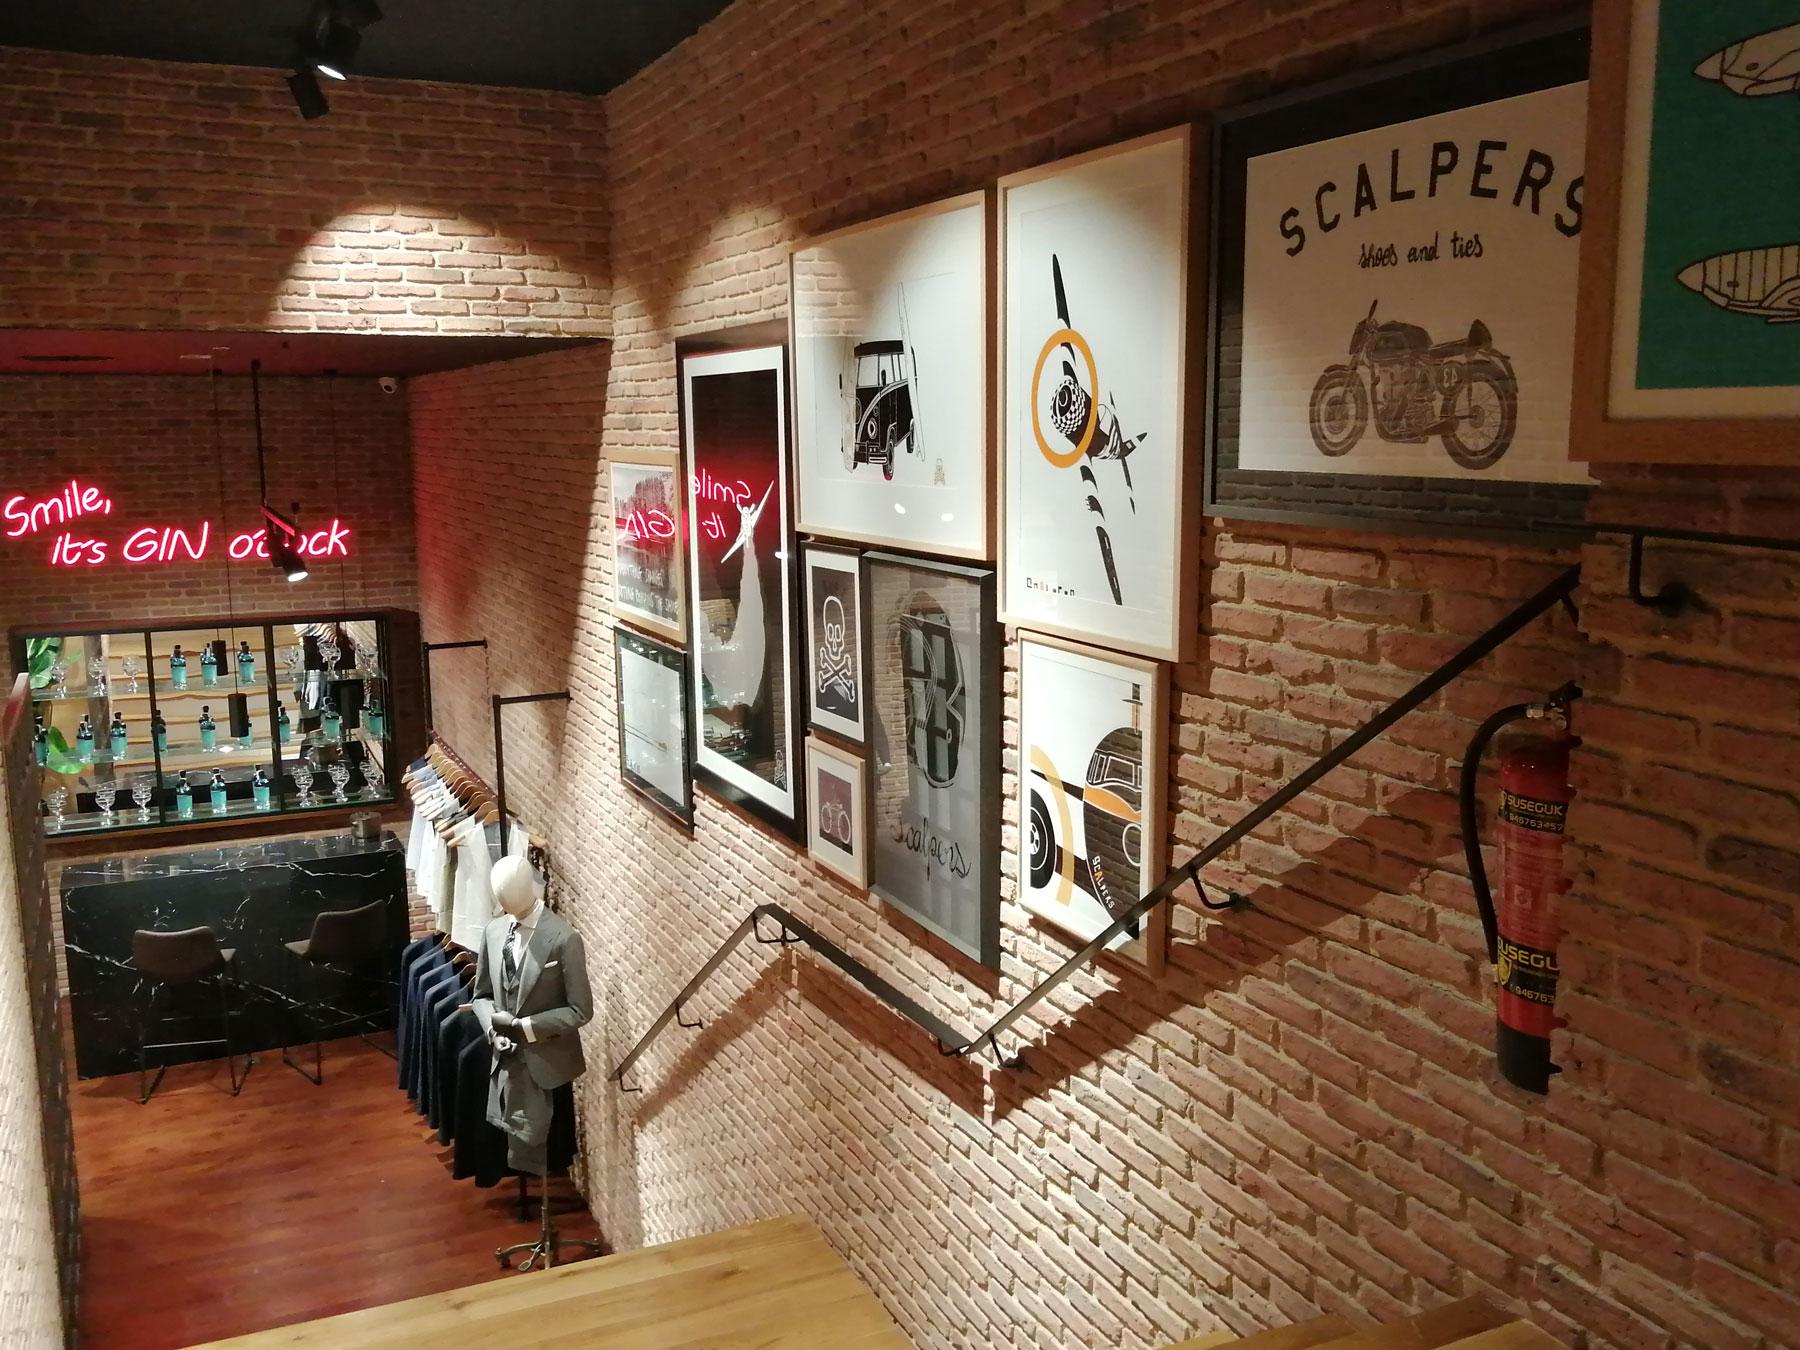 Scalpers Bilbao